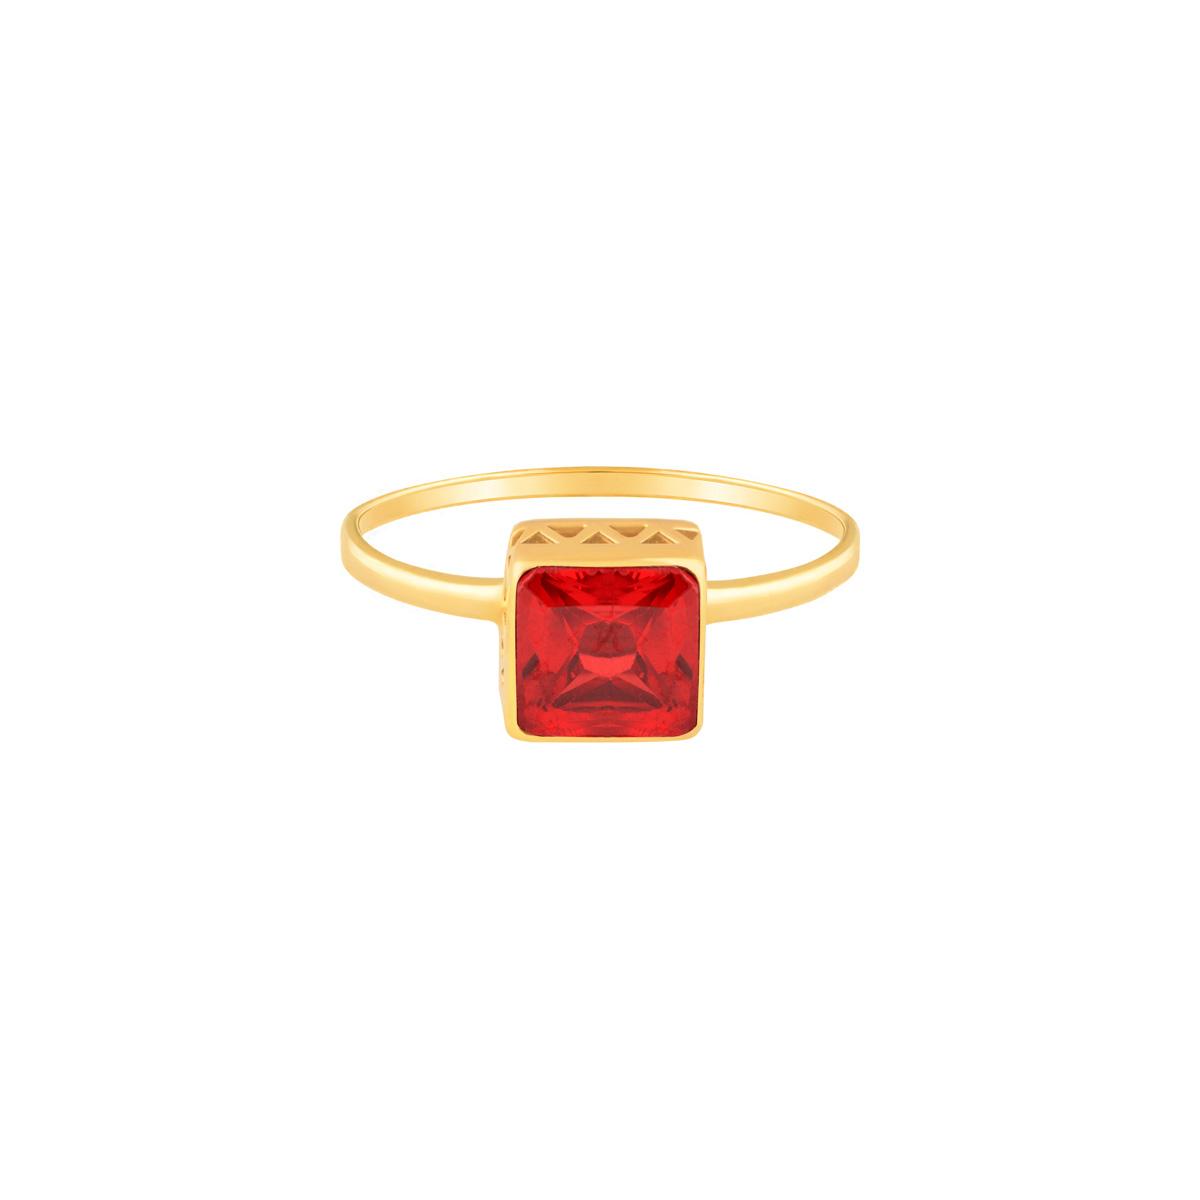 انگشتر طلا تک نگین مربع قرمز